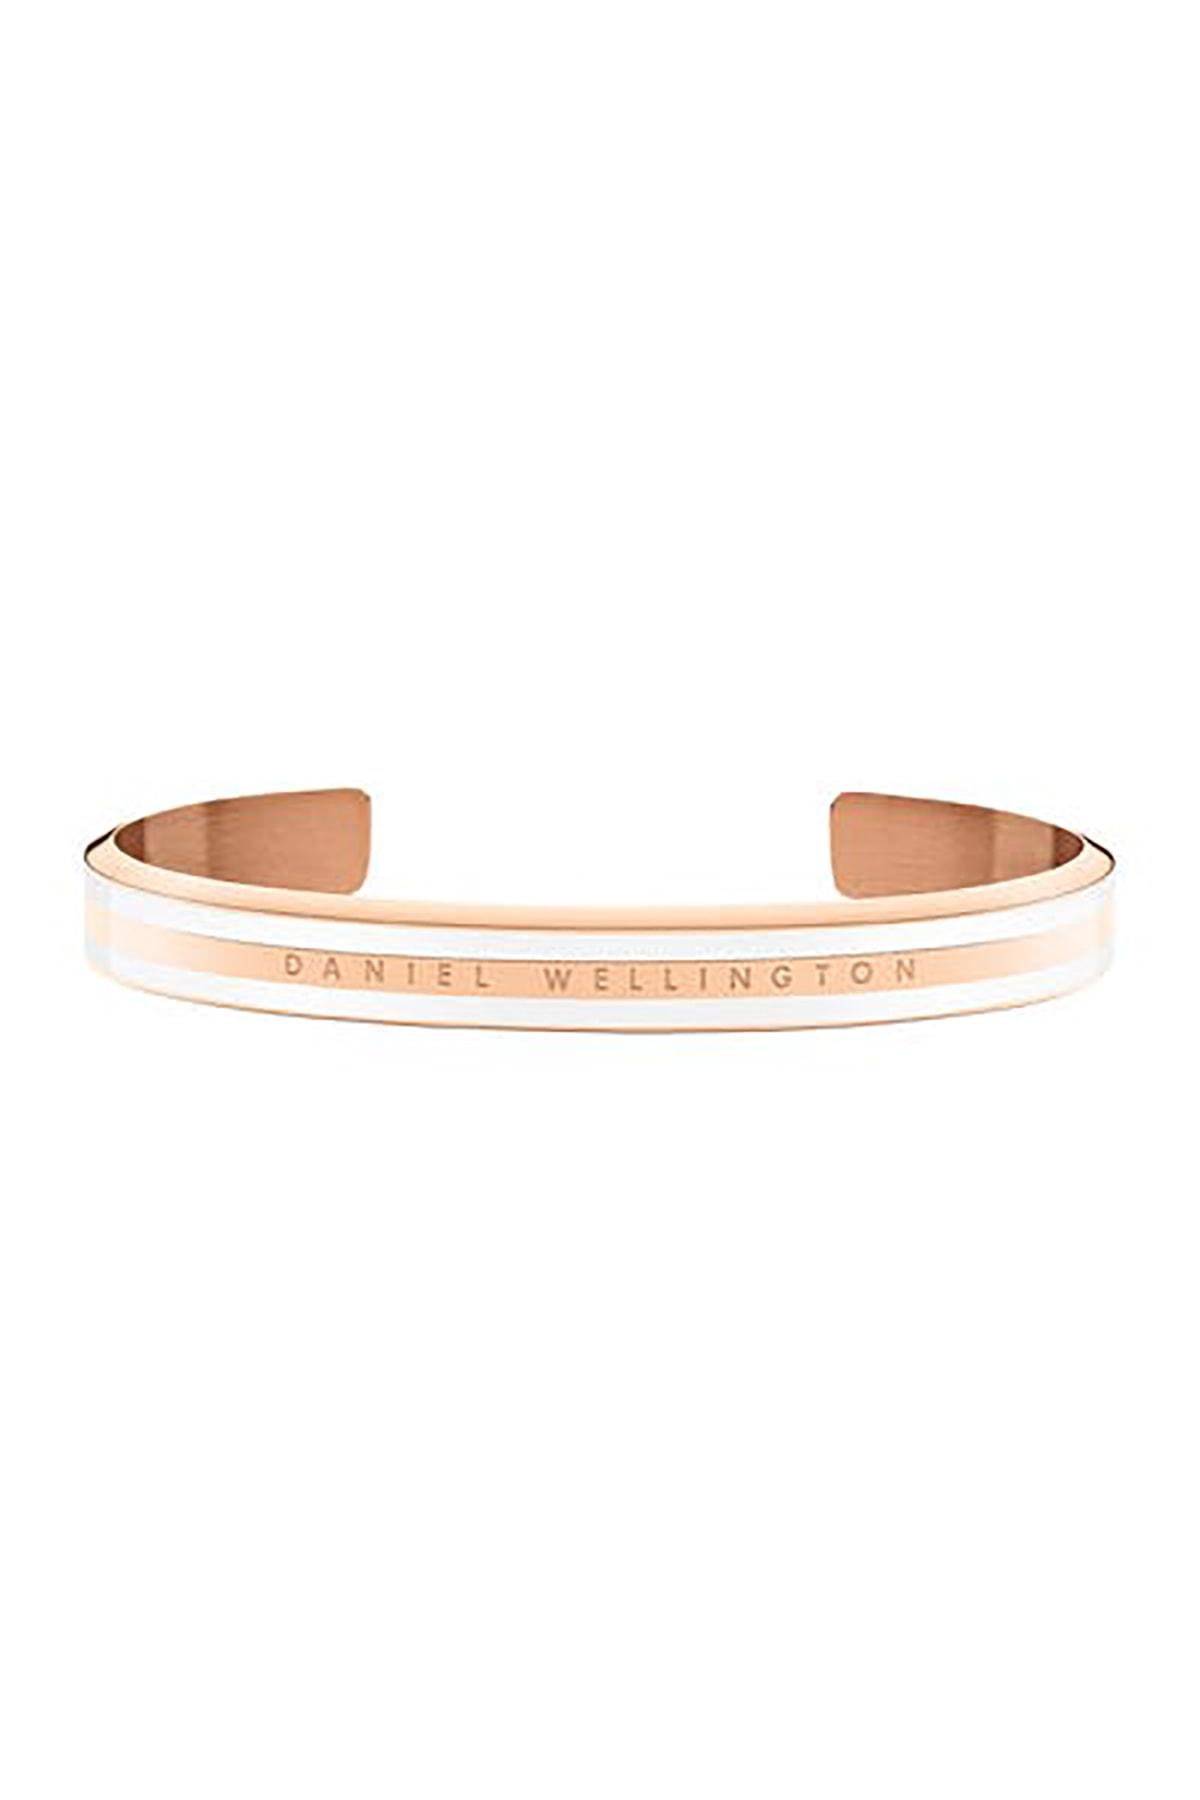 Daniel Wellington Classic Slim Bracelet Rose Gold Satin White Medium - Unisex